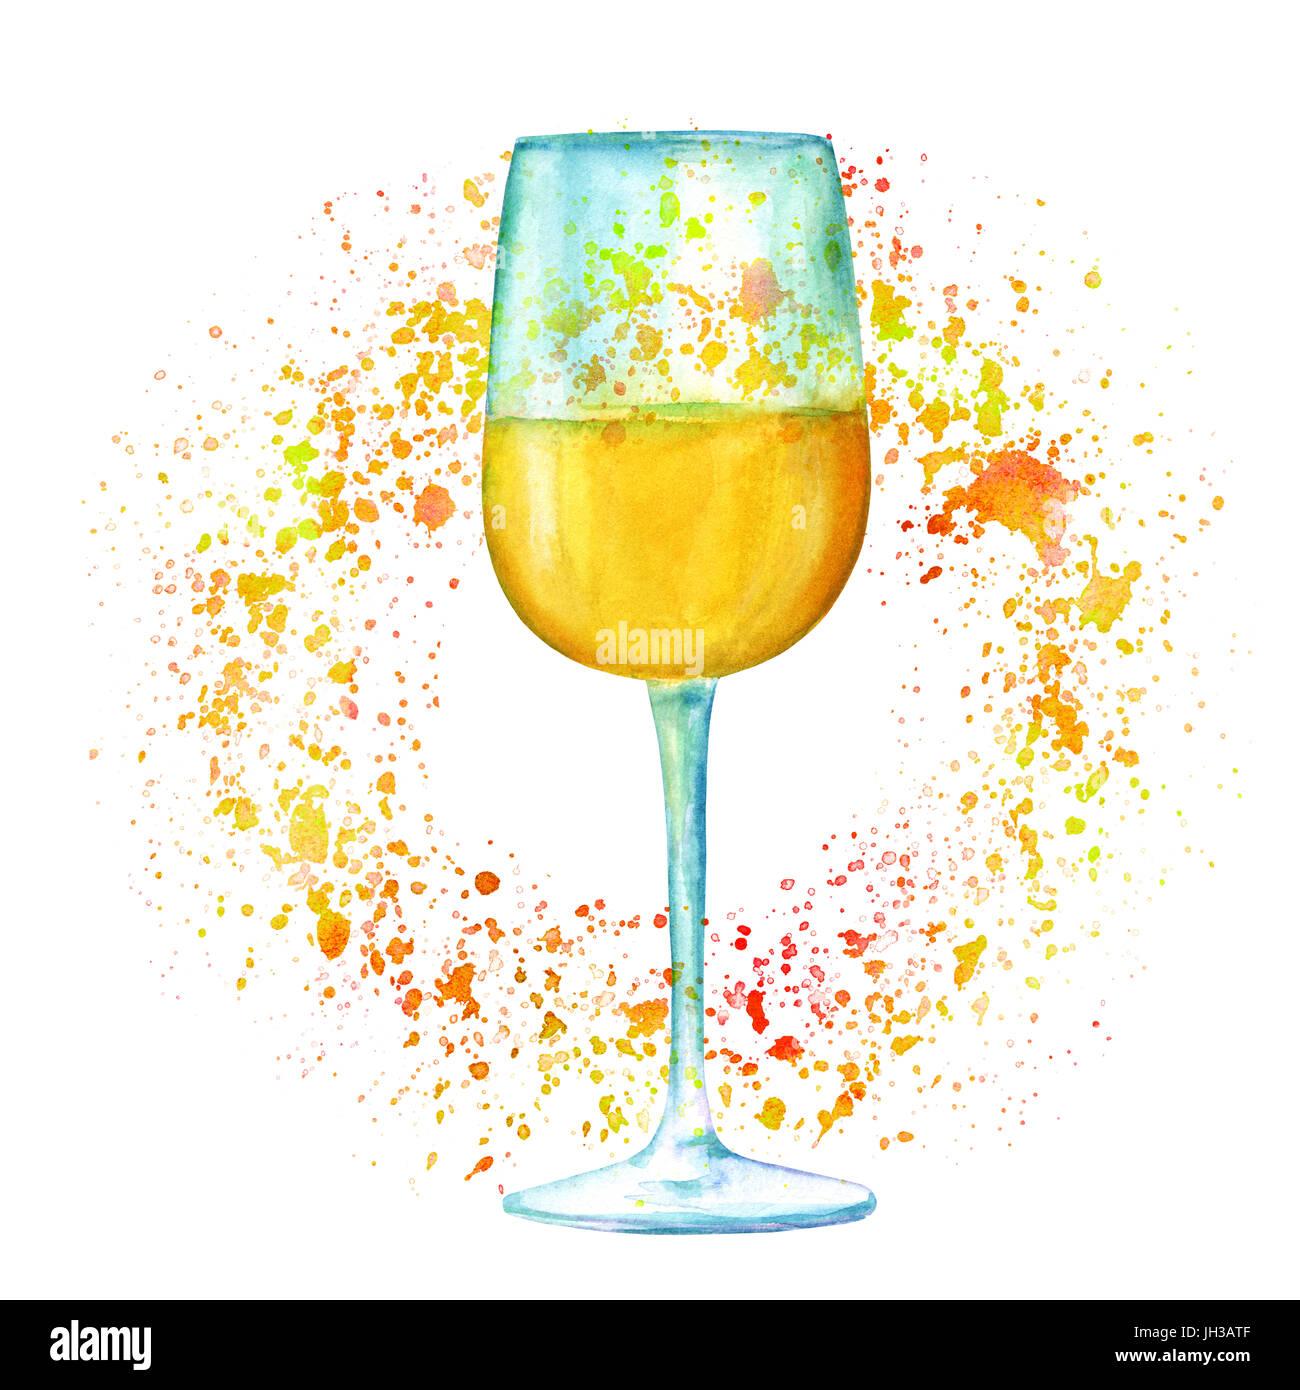 Une aquarelle dessin d 39 un verre de vin blanc peintes la - Dessin de verre ...